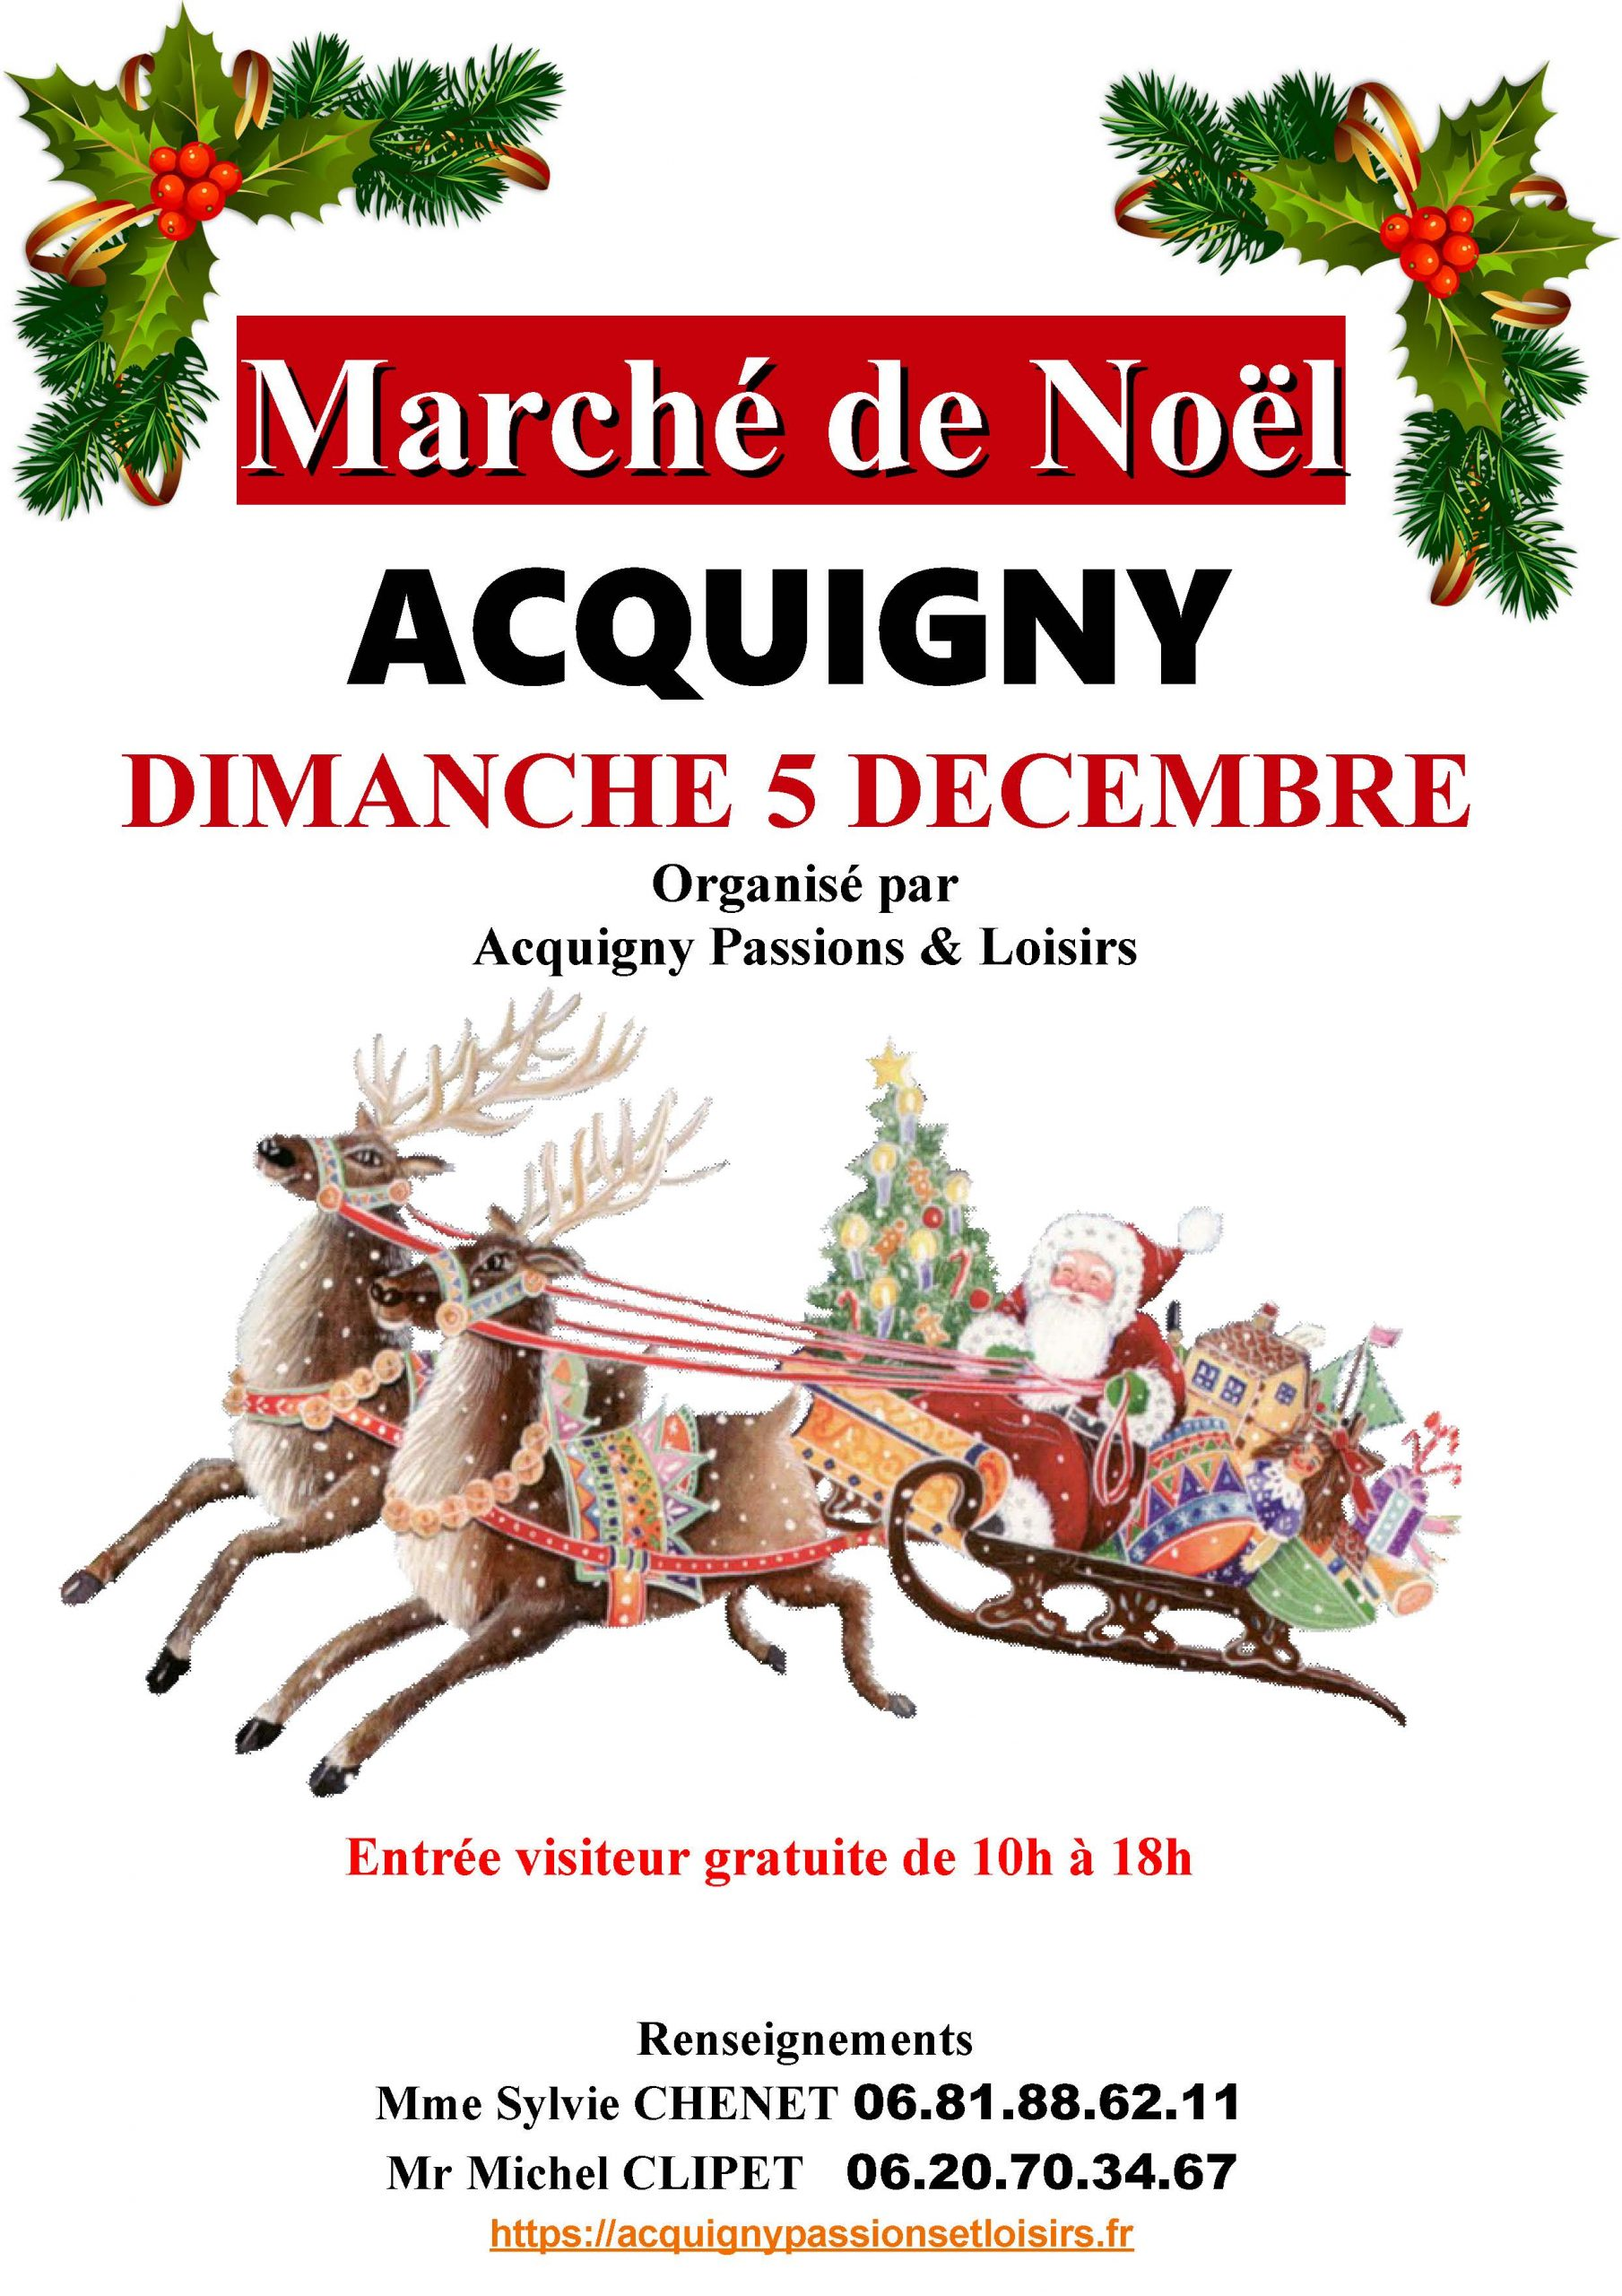 Marché de Noel d'ACQUIGNY